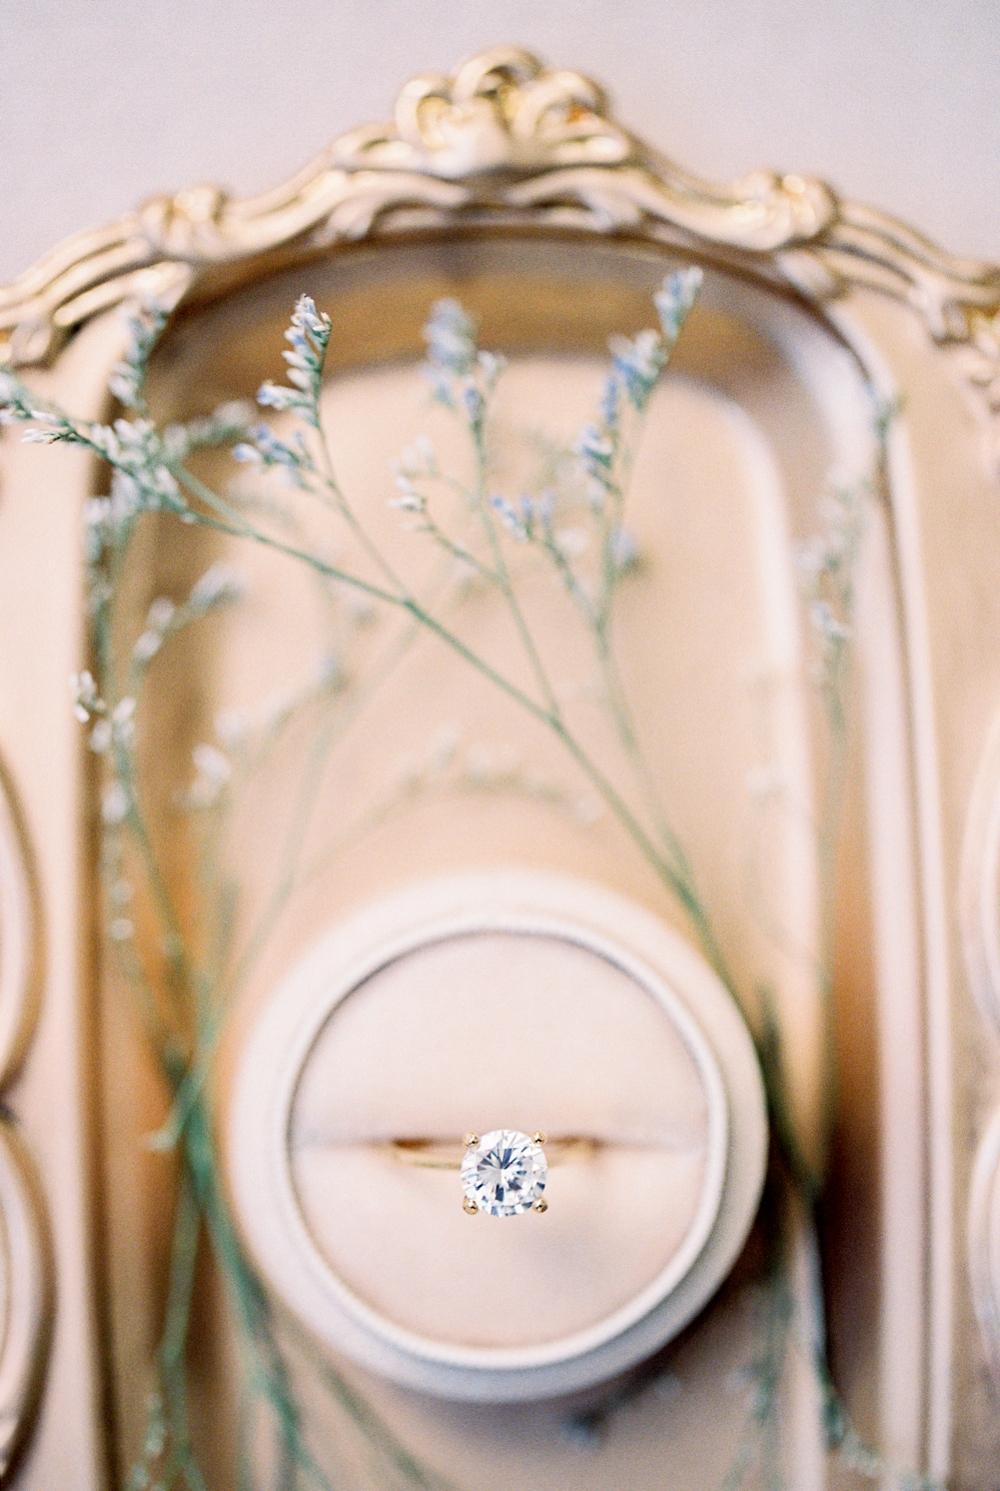 Kristin-La-Voie-Photography-fine-art-wedding-bridal-boudoir-texas-photographer-Dallas-Austin-San-Marcos-wahwahtaysee-resort-19